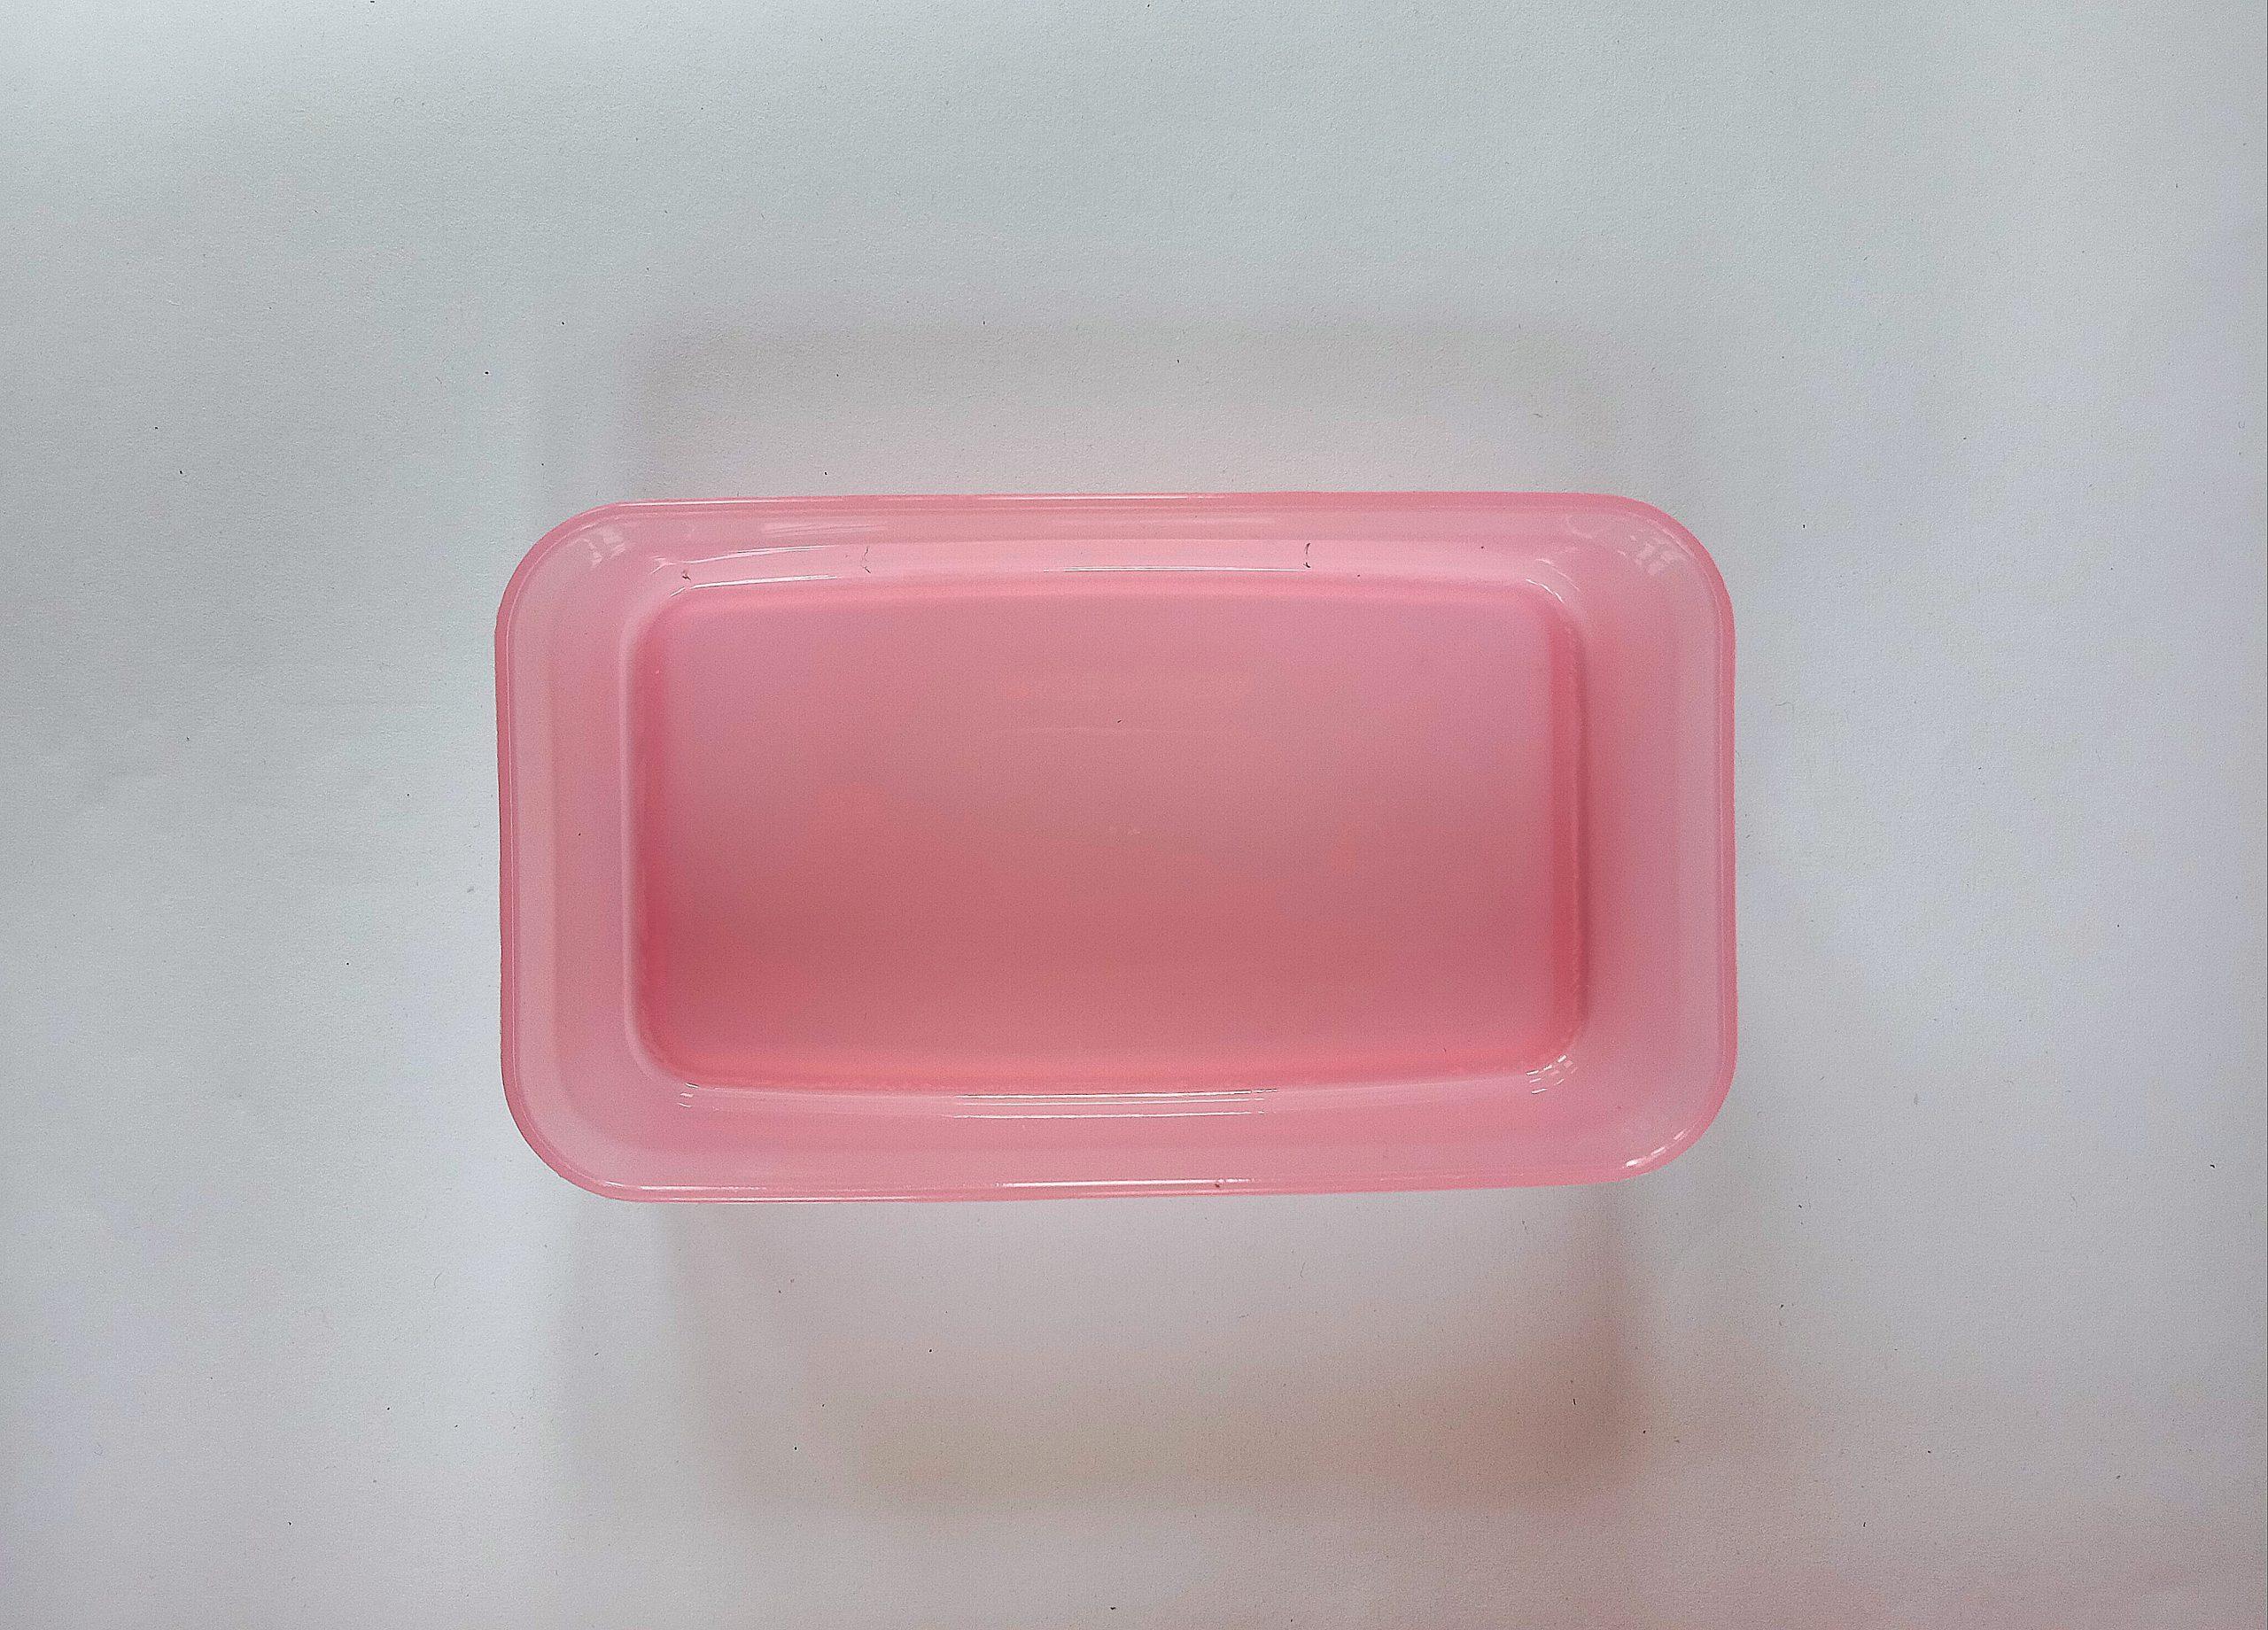 A plastic box